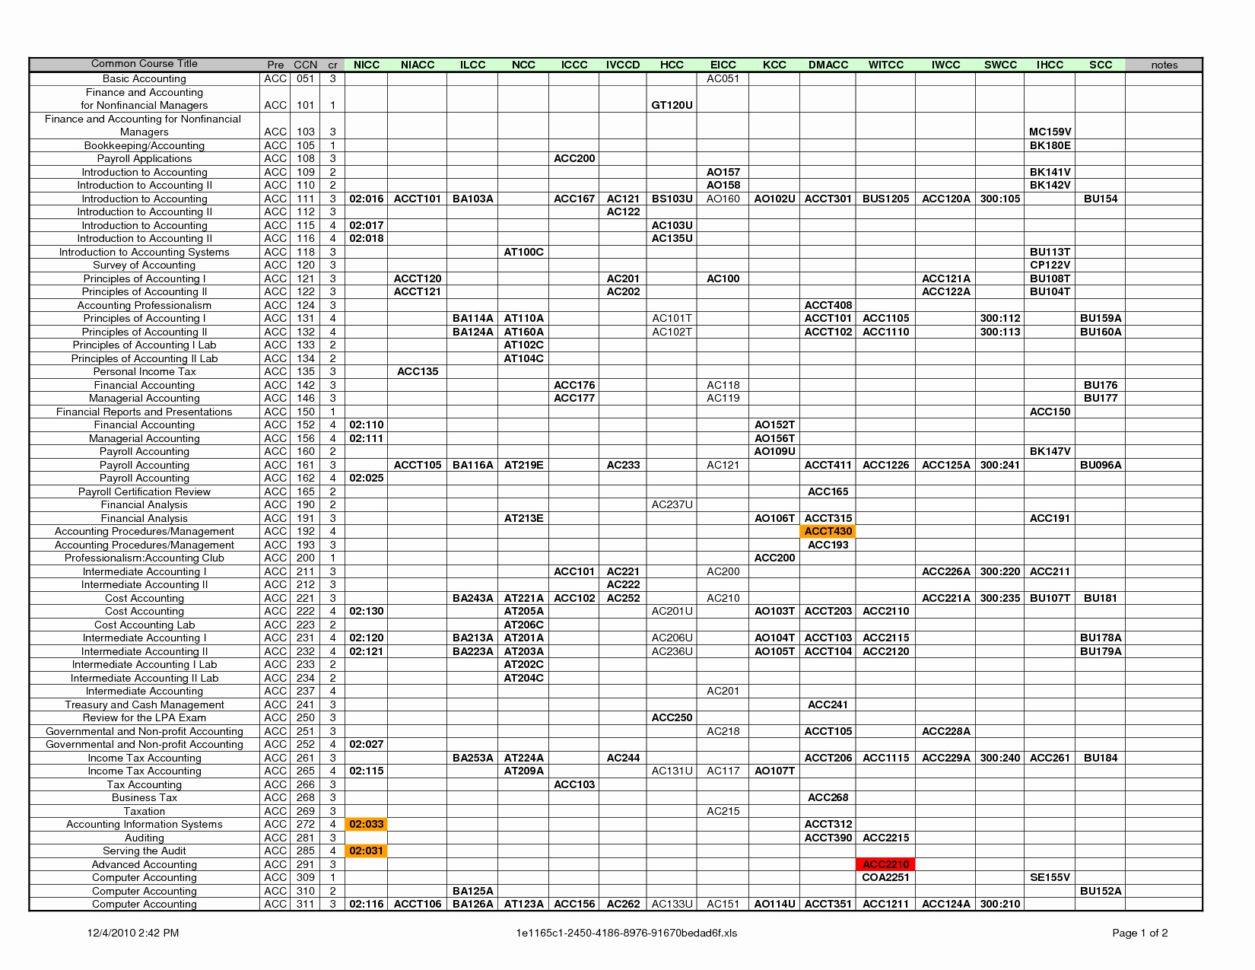 Bookkeeping Spreadsheet Using Microsoft Excel Lovely Bookkeeping For In Contractor Bookkeeping Spreadsheet